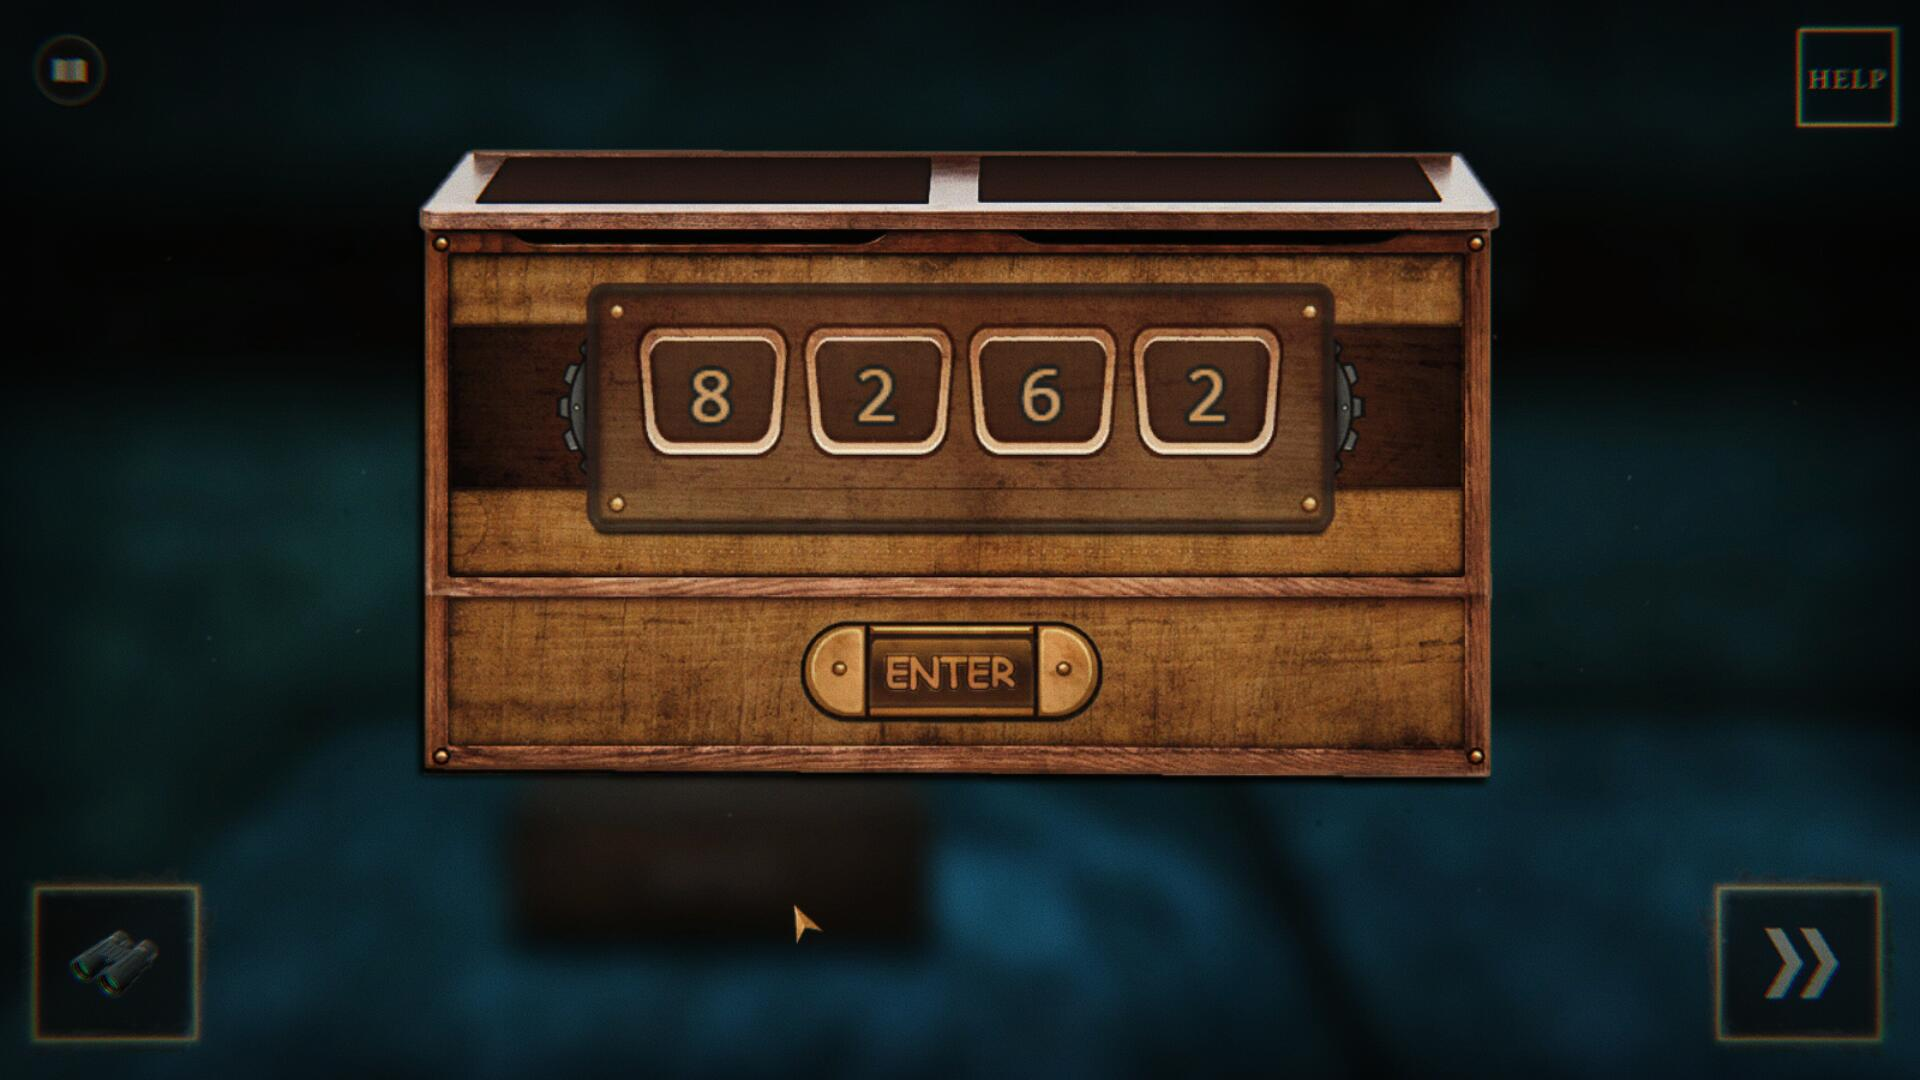 Darkroom游戏攻略 暗室困难难度第二章